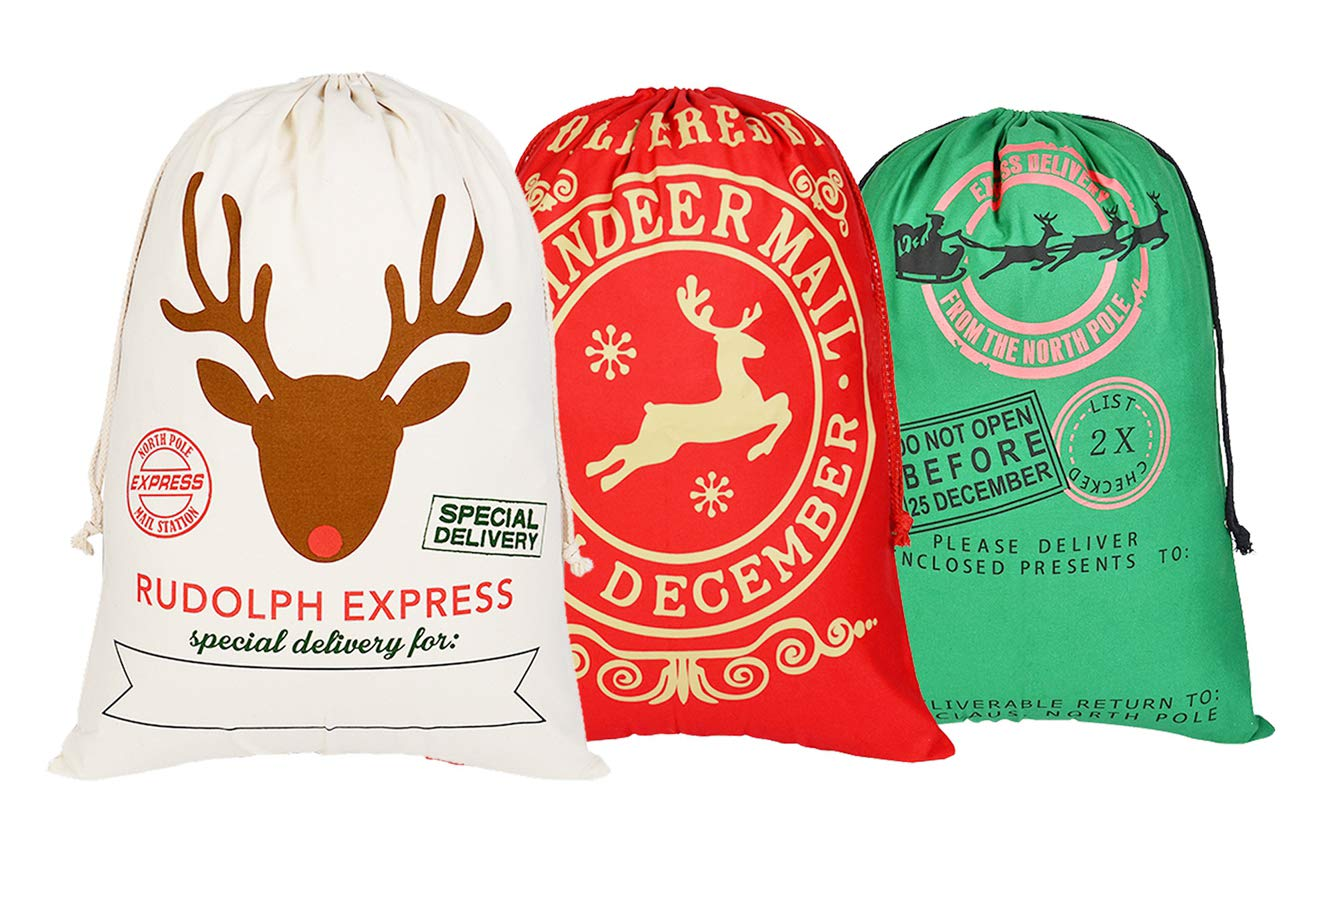 5cae5cd4 KEFAN 3 Pack Christmas Bag Santa Sack Canvas Bag for Gifts Santa Sack with  Drawstrings Extra